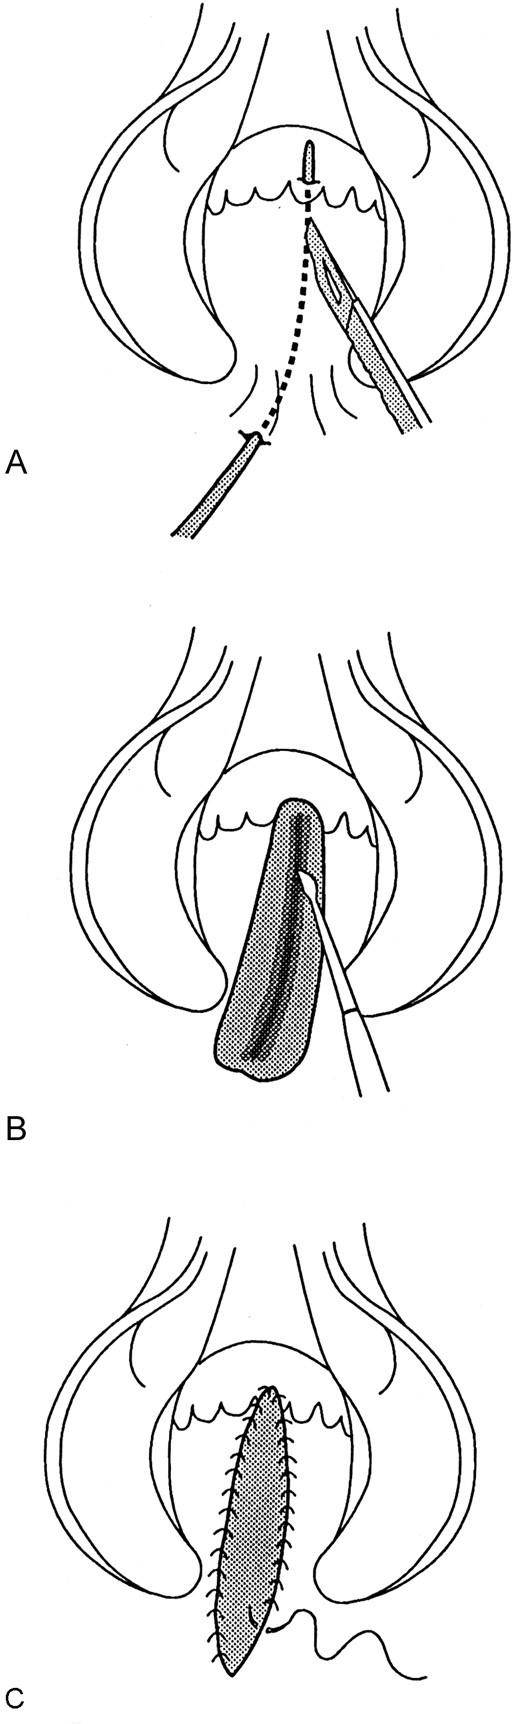 Benign Anorectal: Abscess and Fistula | SpringerLink